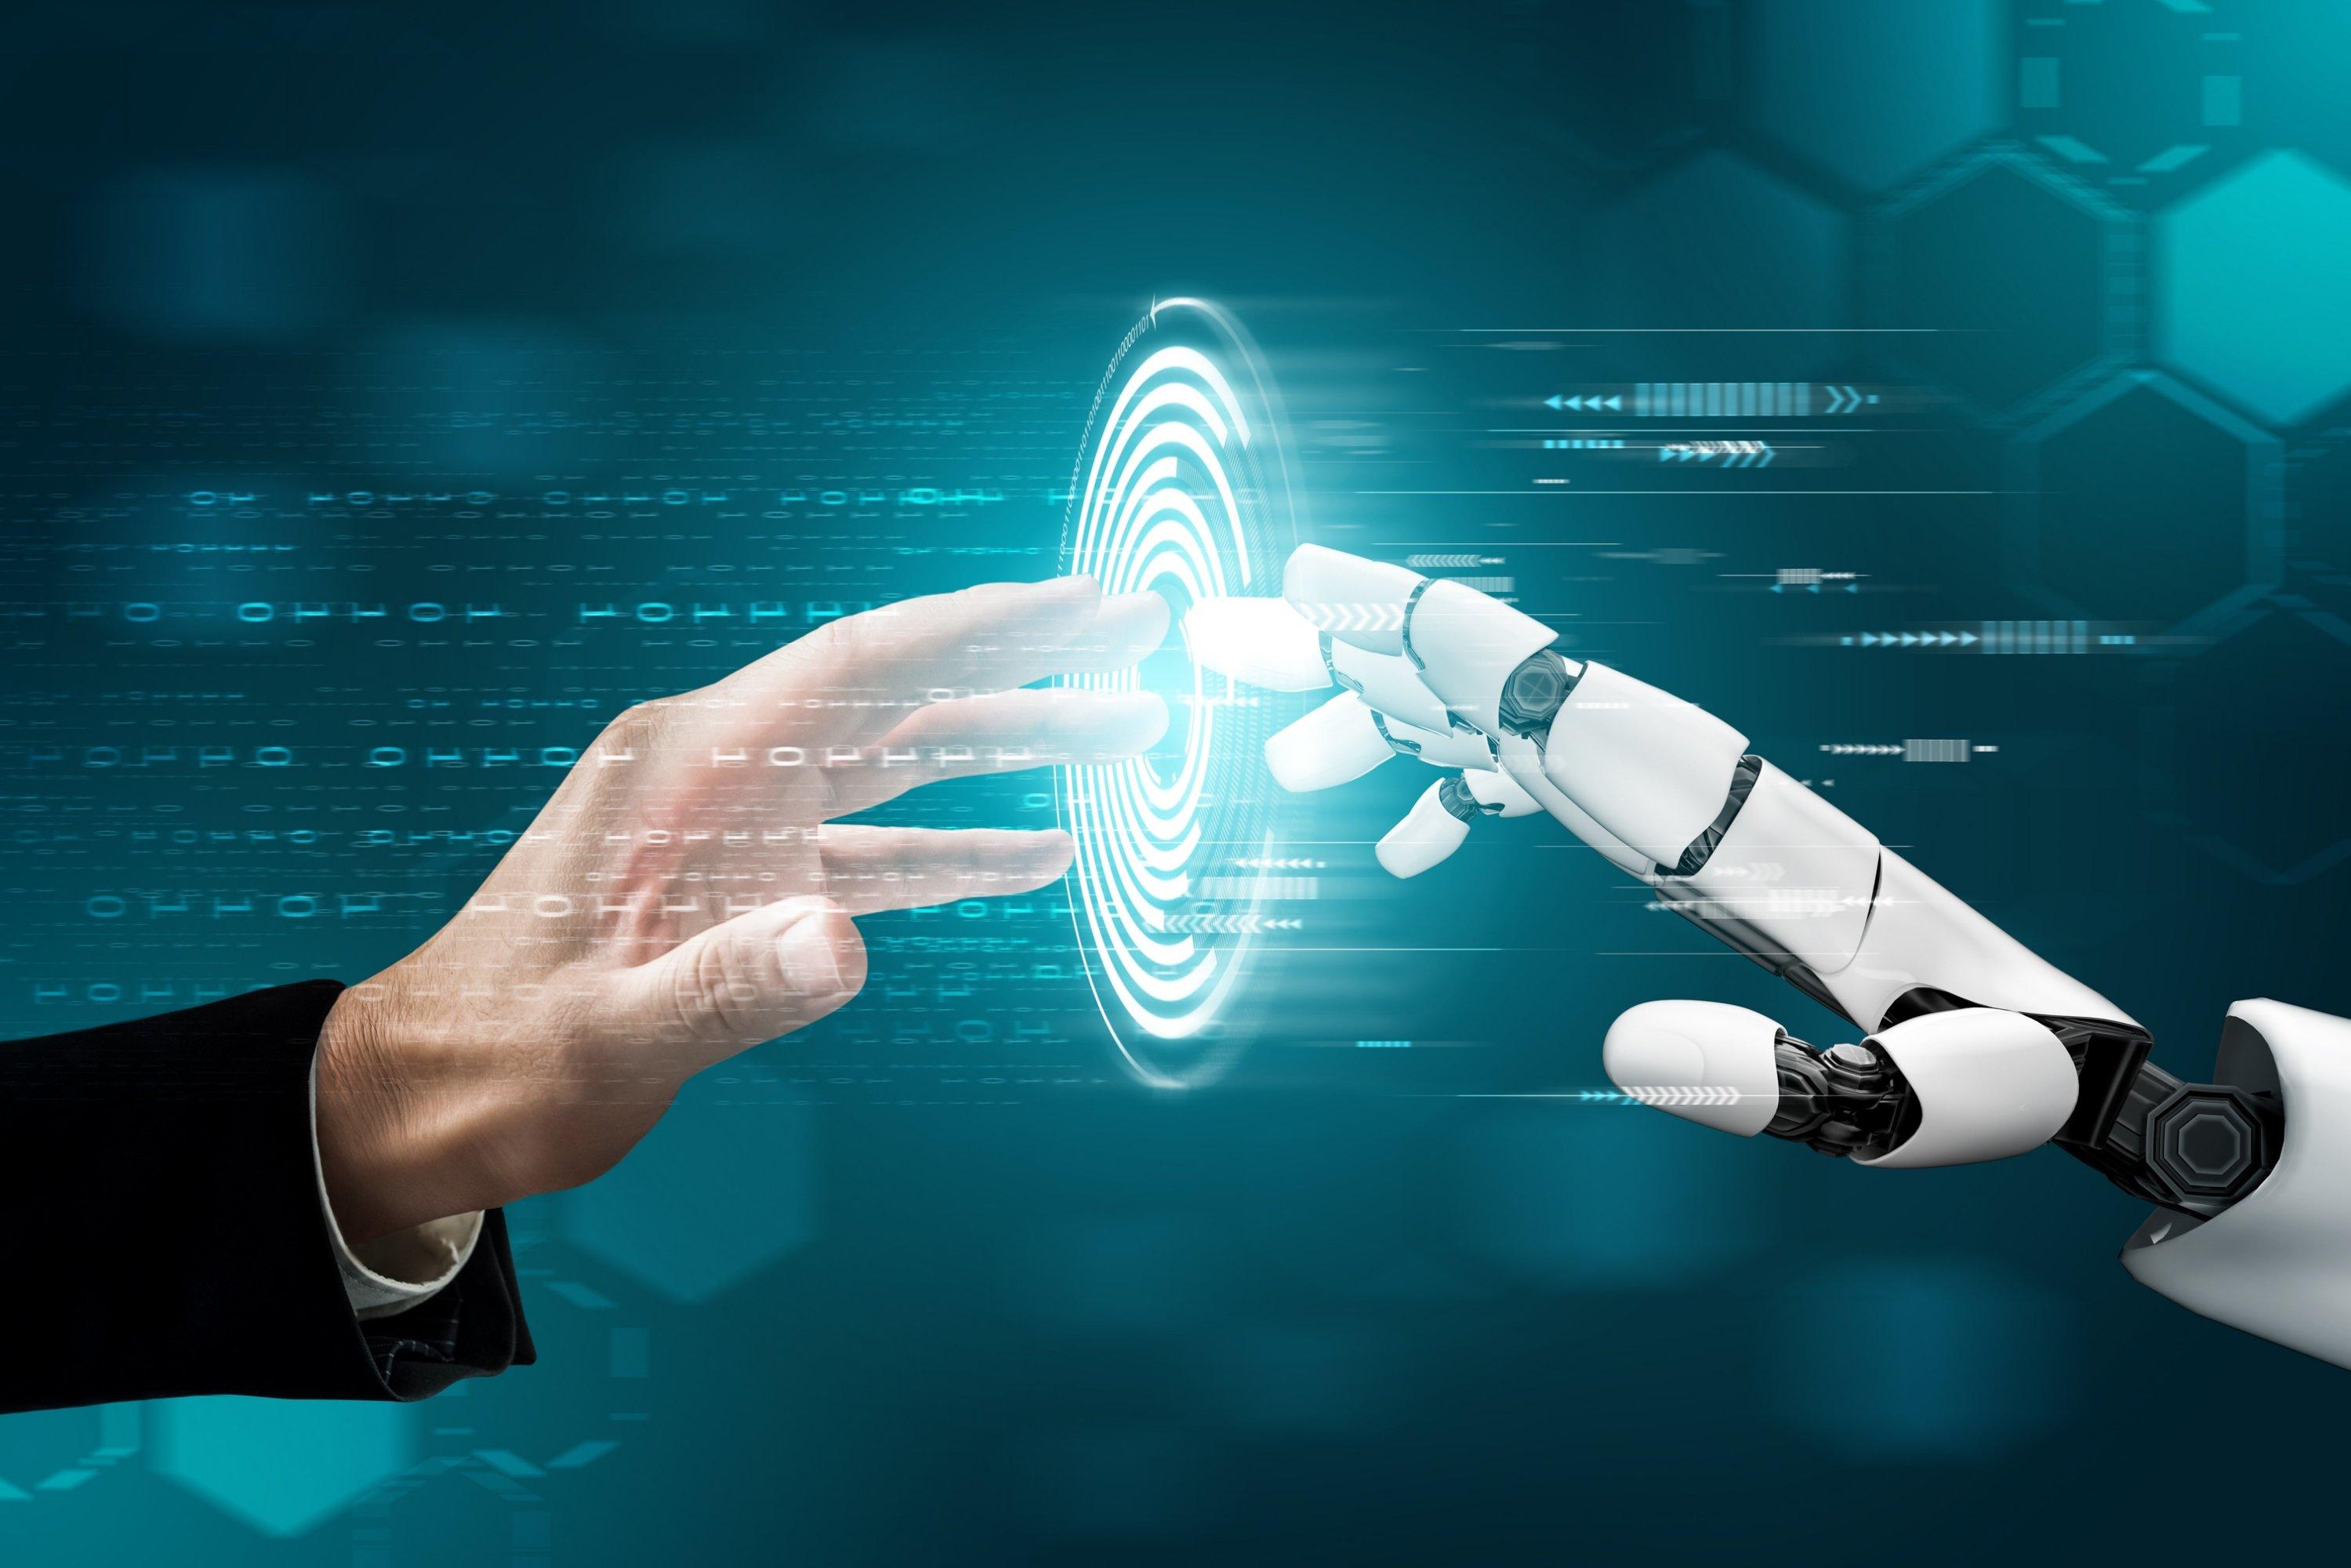 futuristic-robot-artificial-intelligence-concept